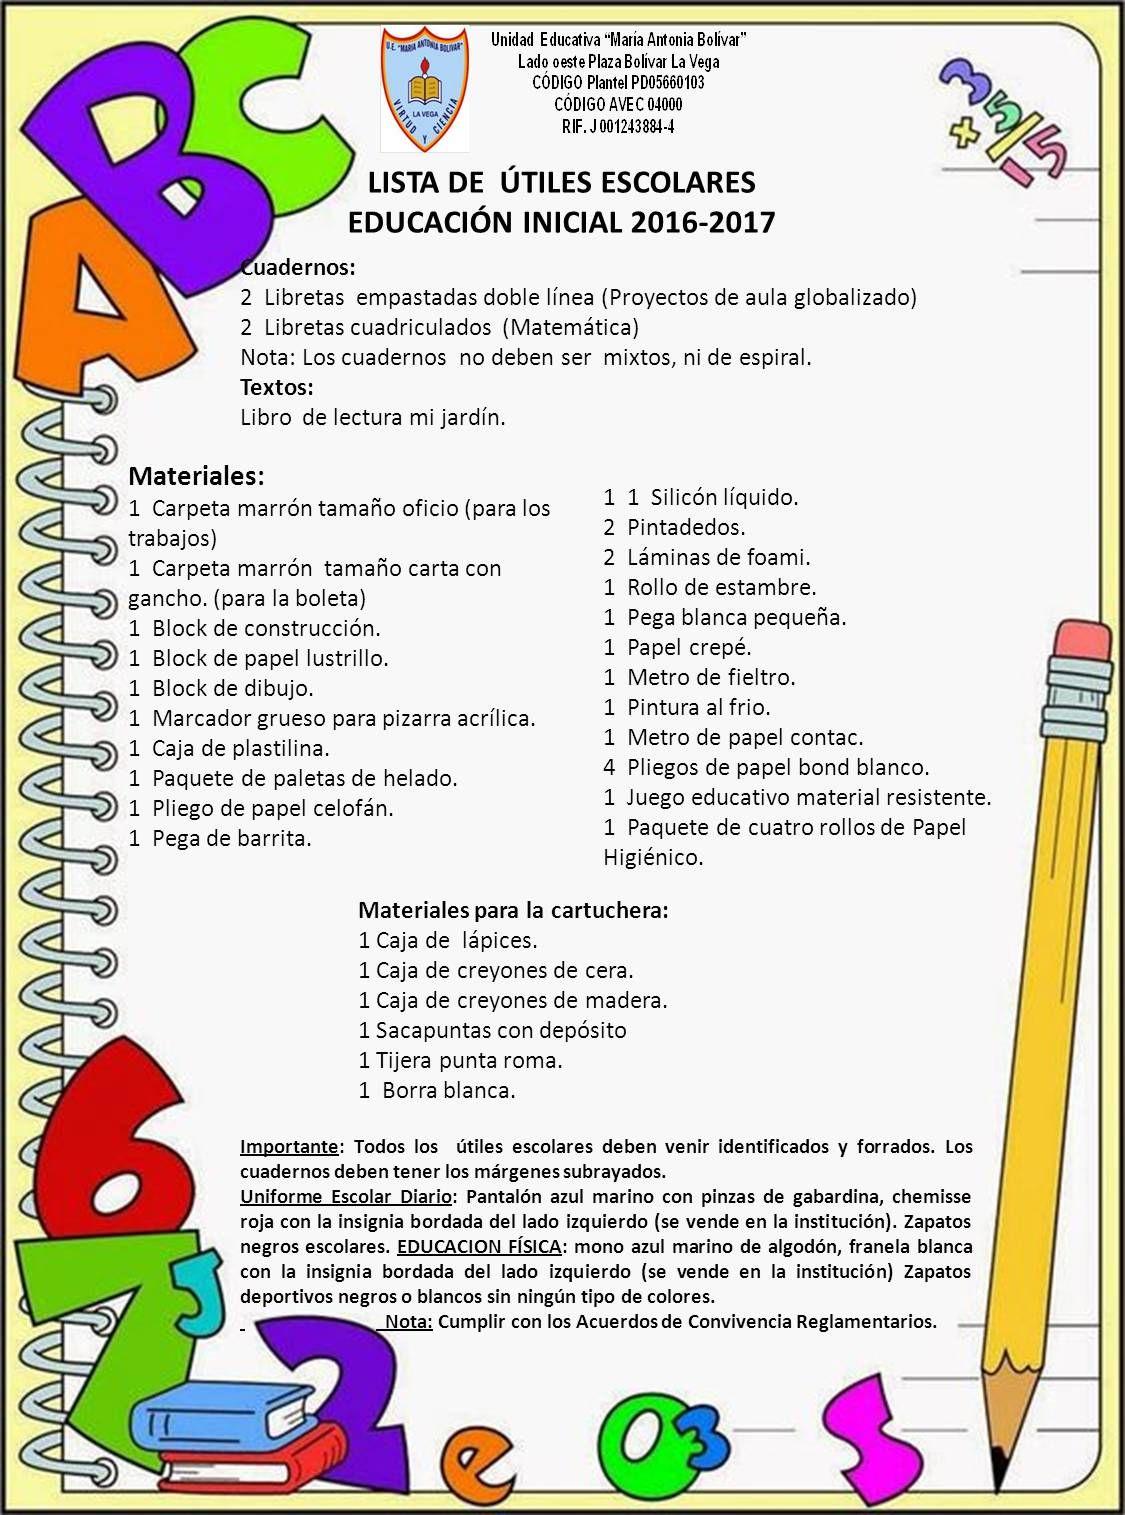 lista de utiles escolares - Google Search | Mrs Herrera | Pinterest ...